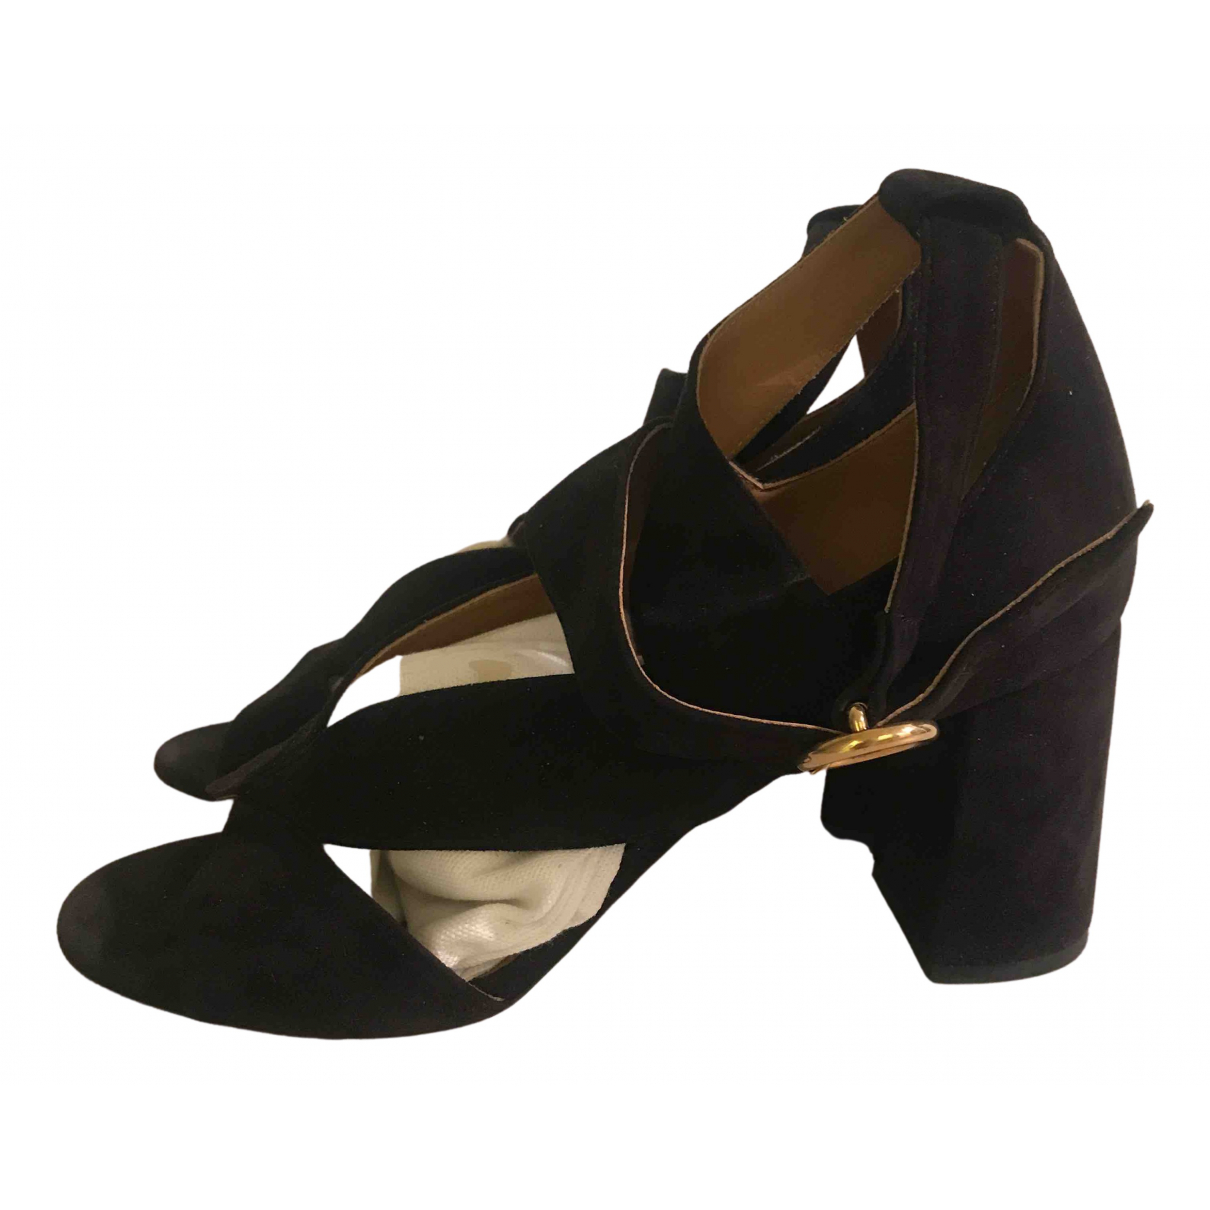 Chloé N Black Suede Sandals for Women 39 EU